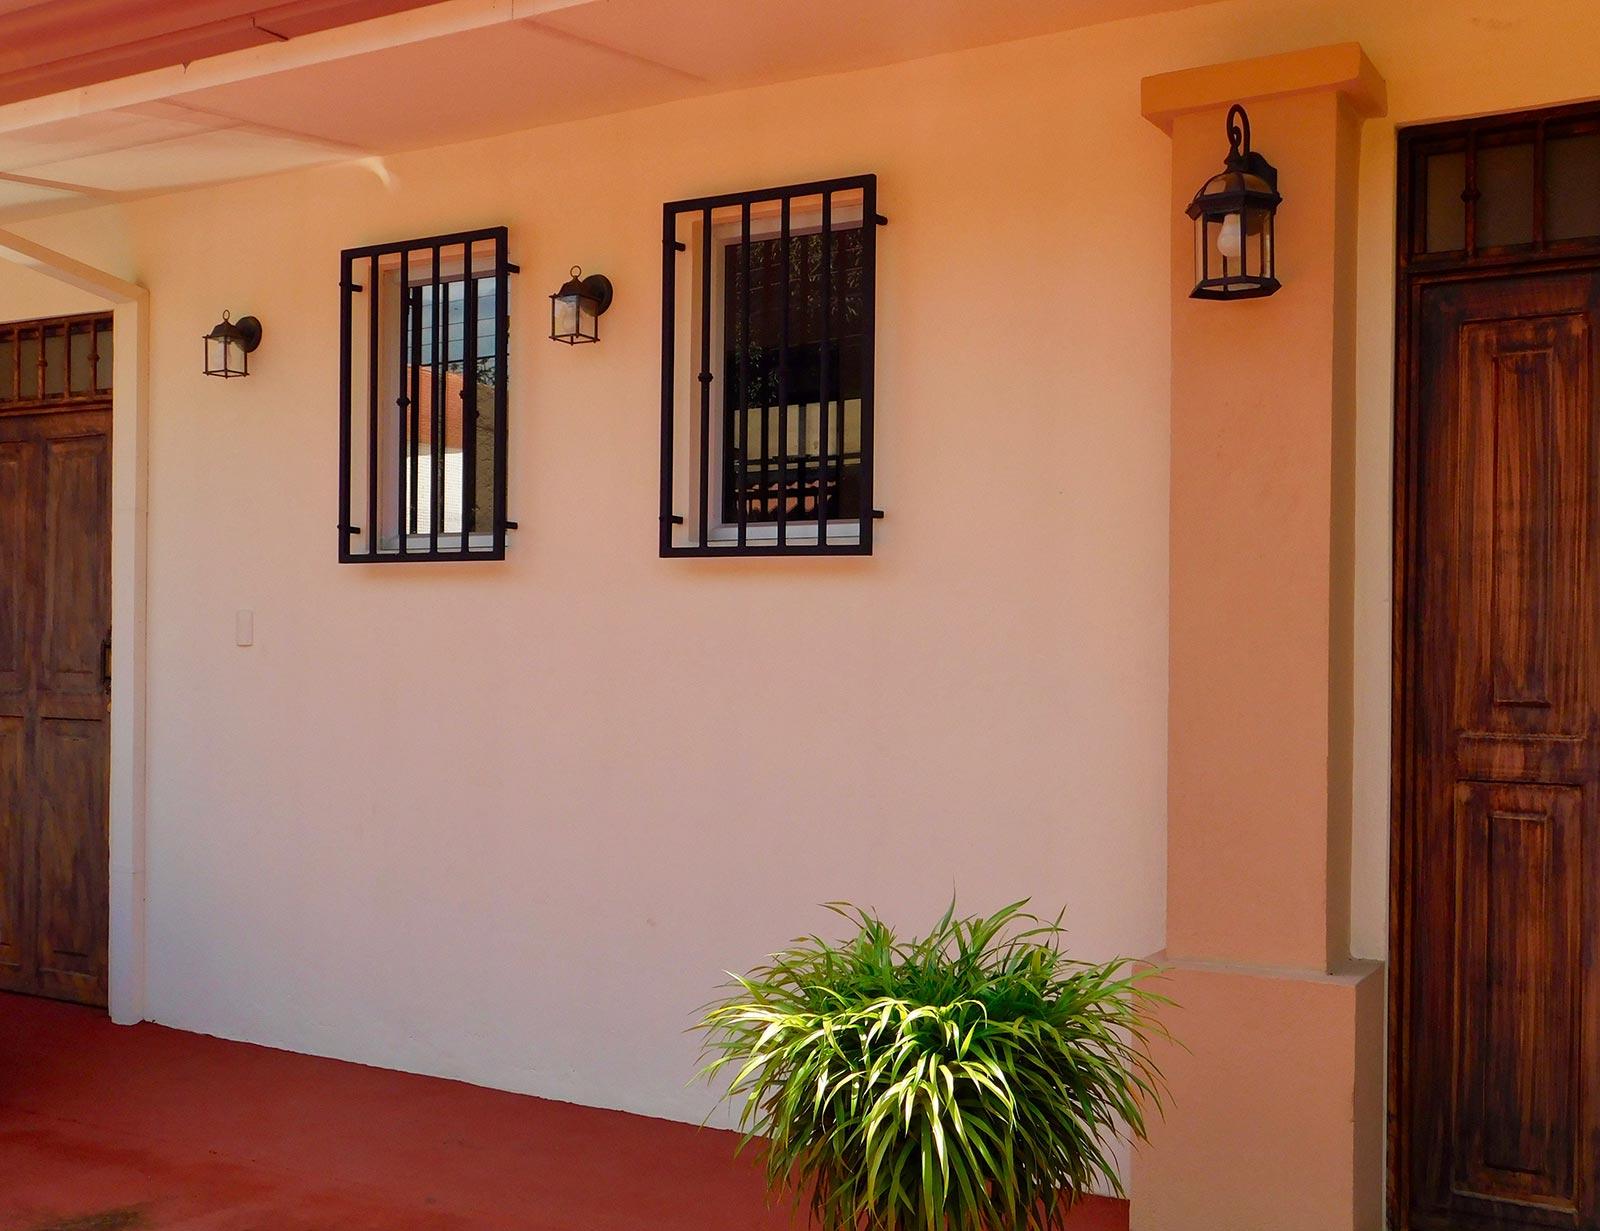 residential neighborhoods central valley costa rica